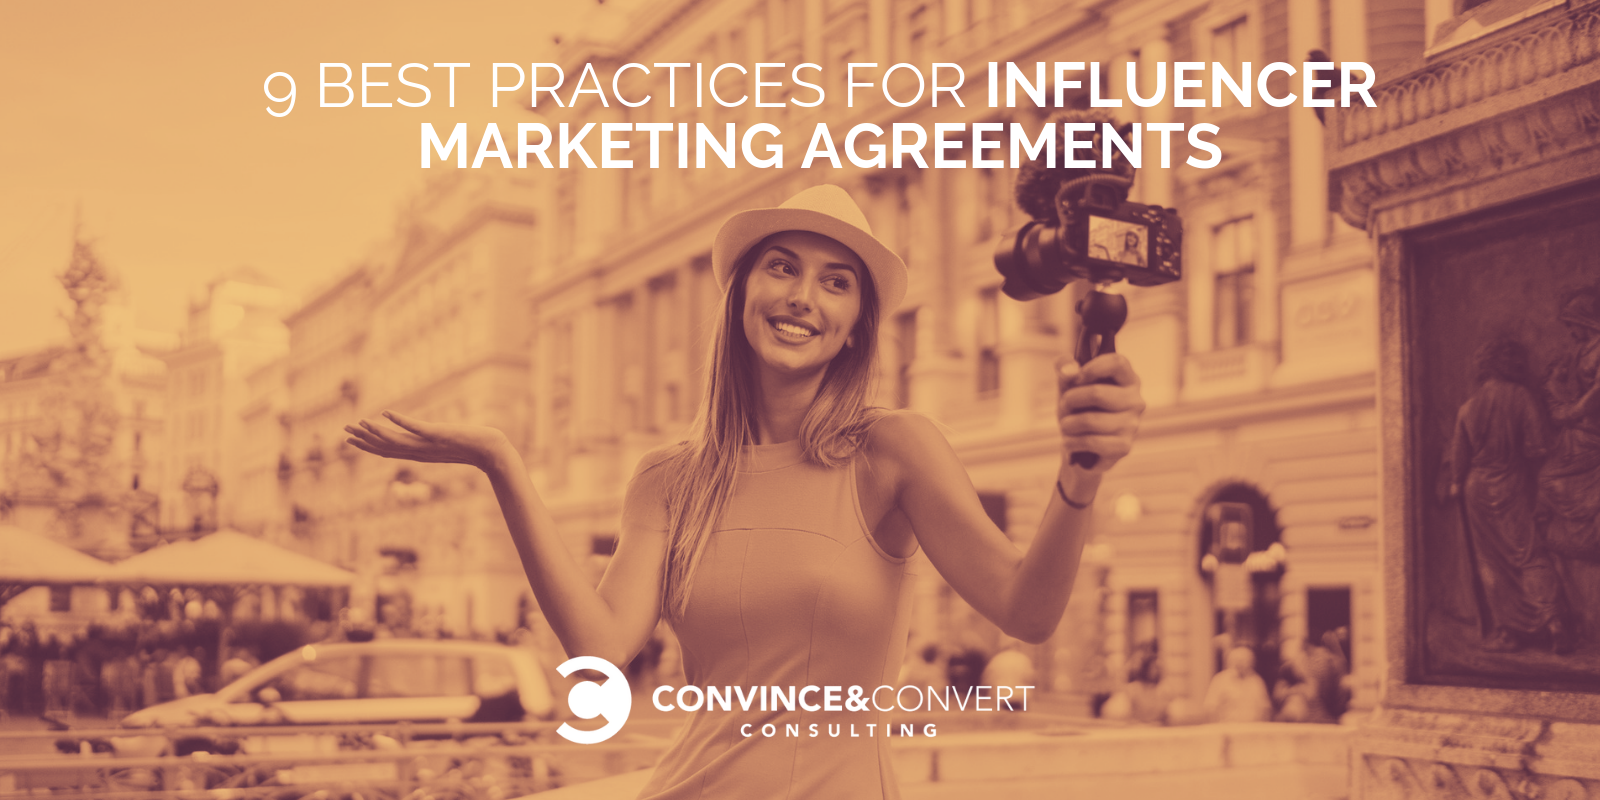 influencer accordi di marketing